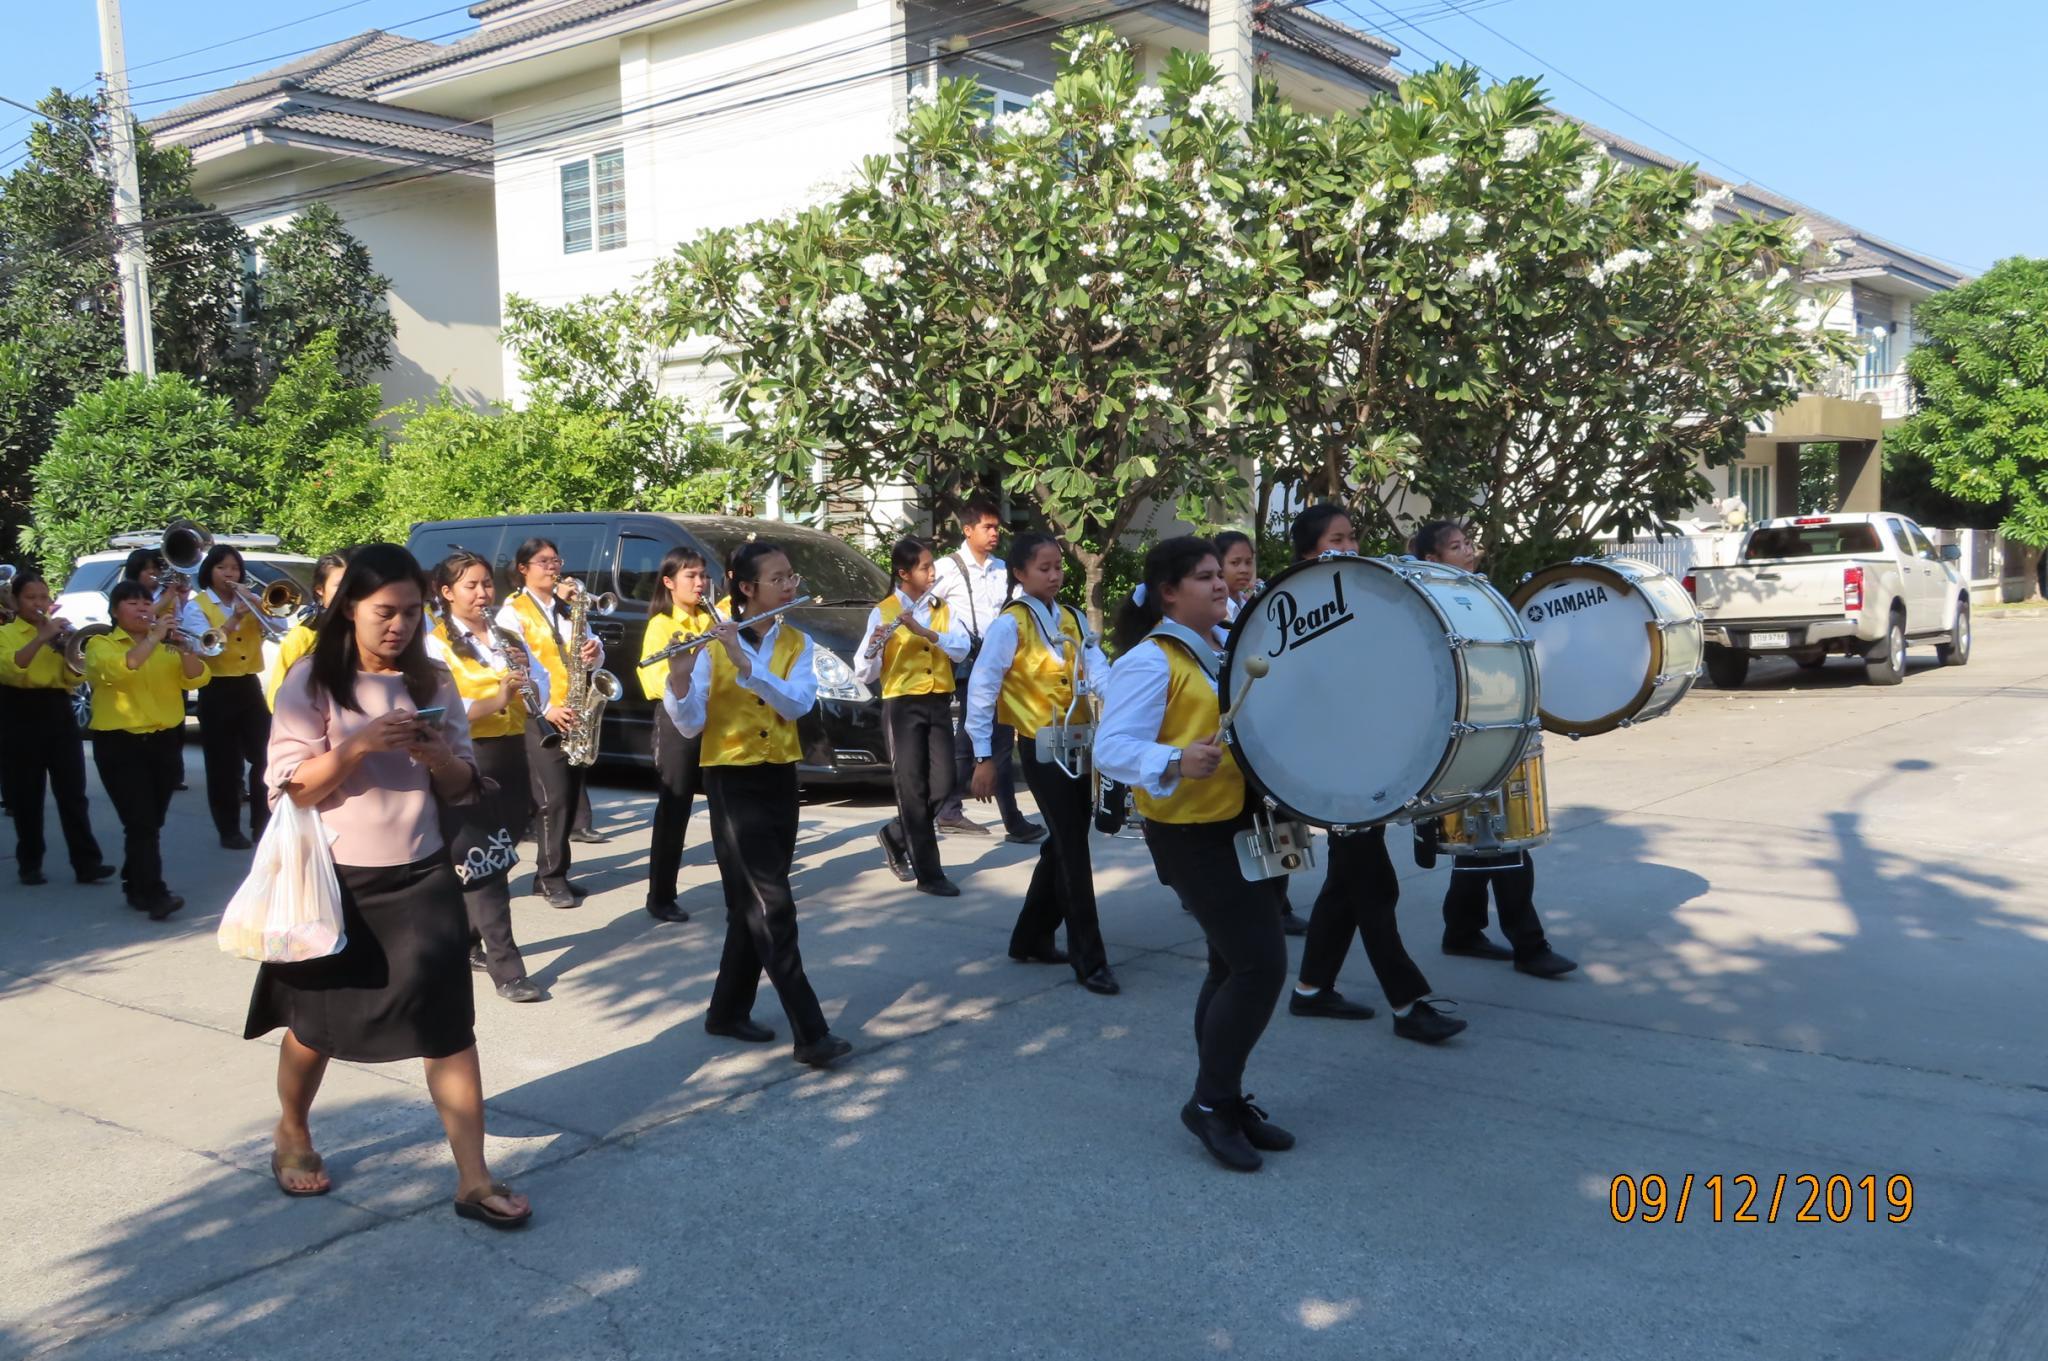 Wedding Procession - abbreviated-img_1766-jpg